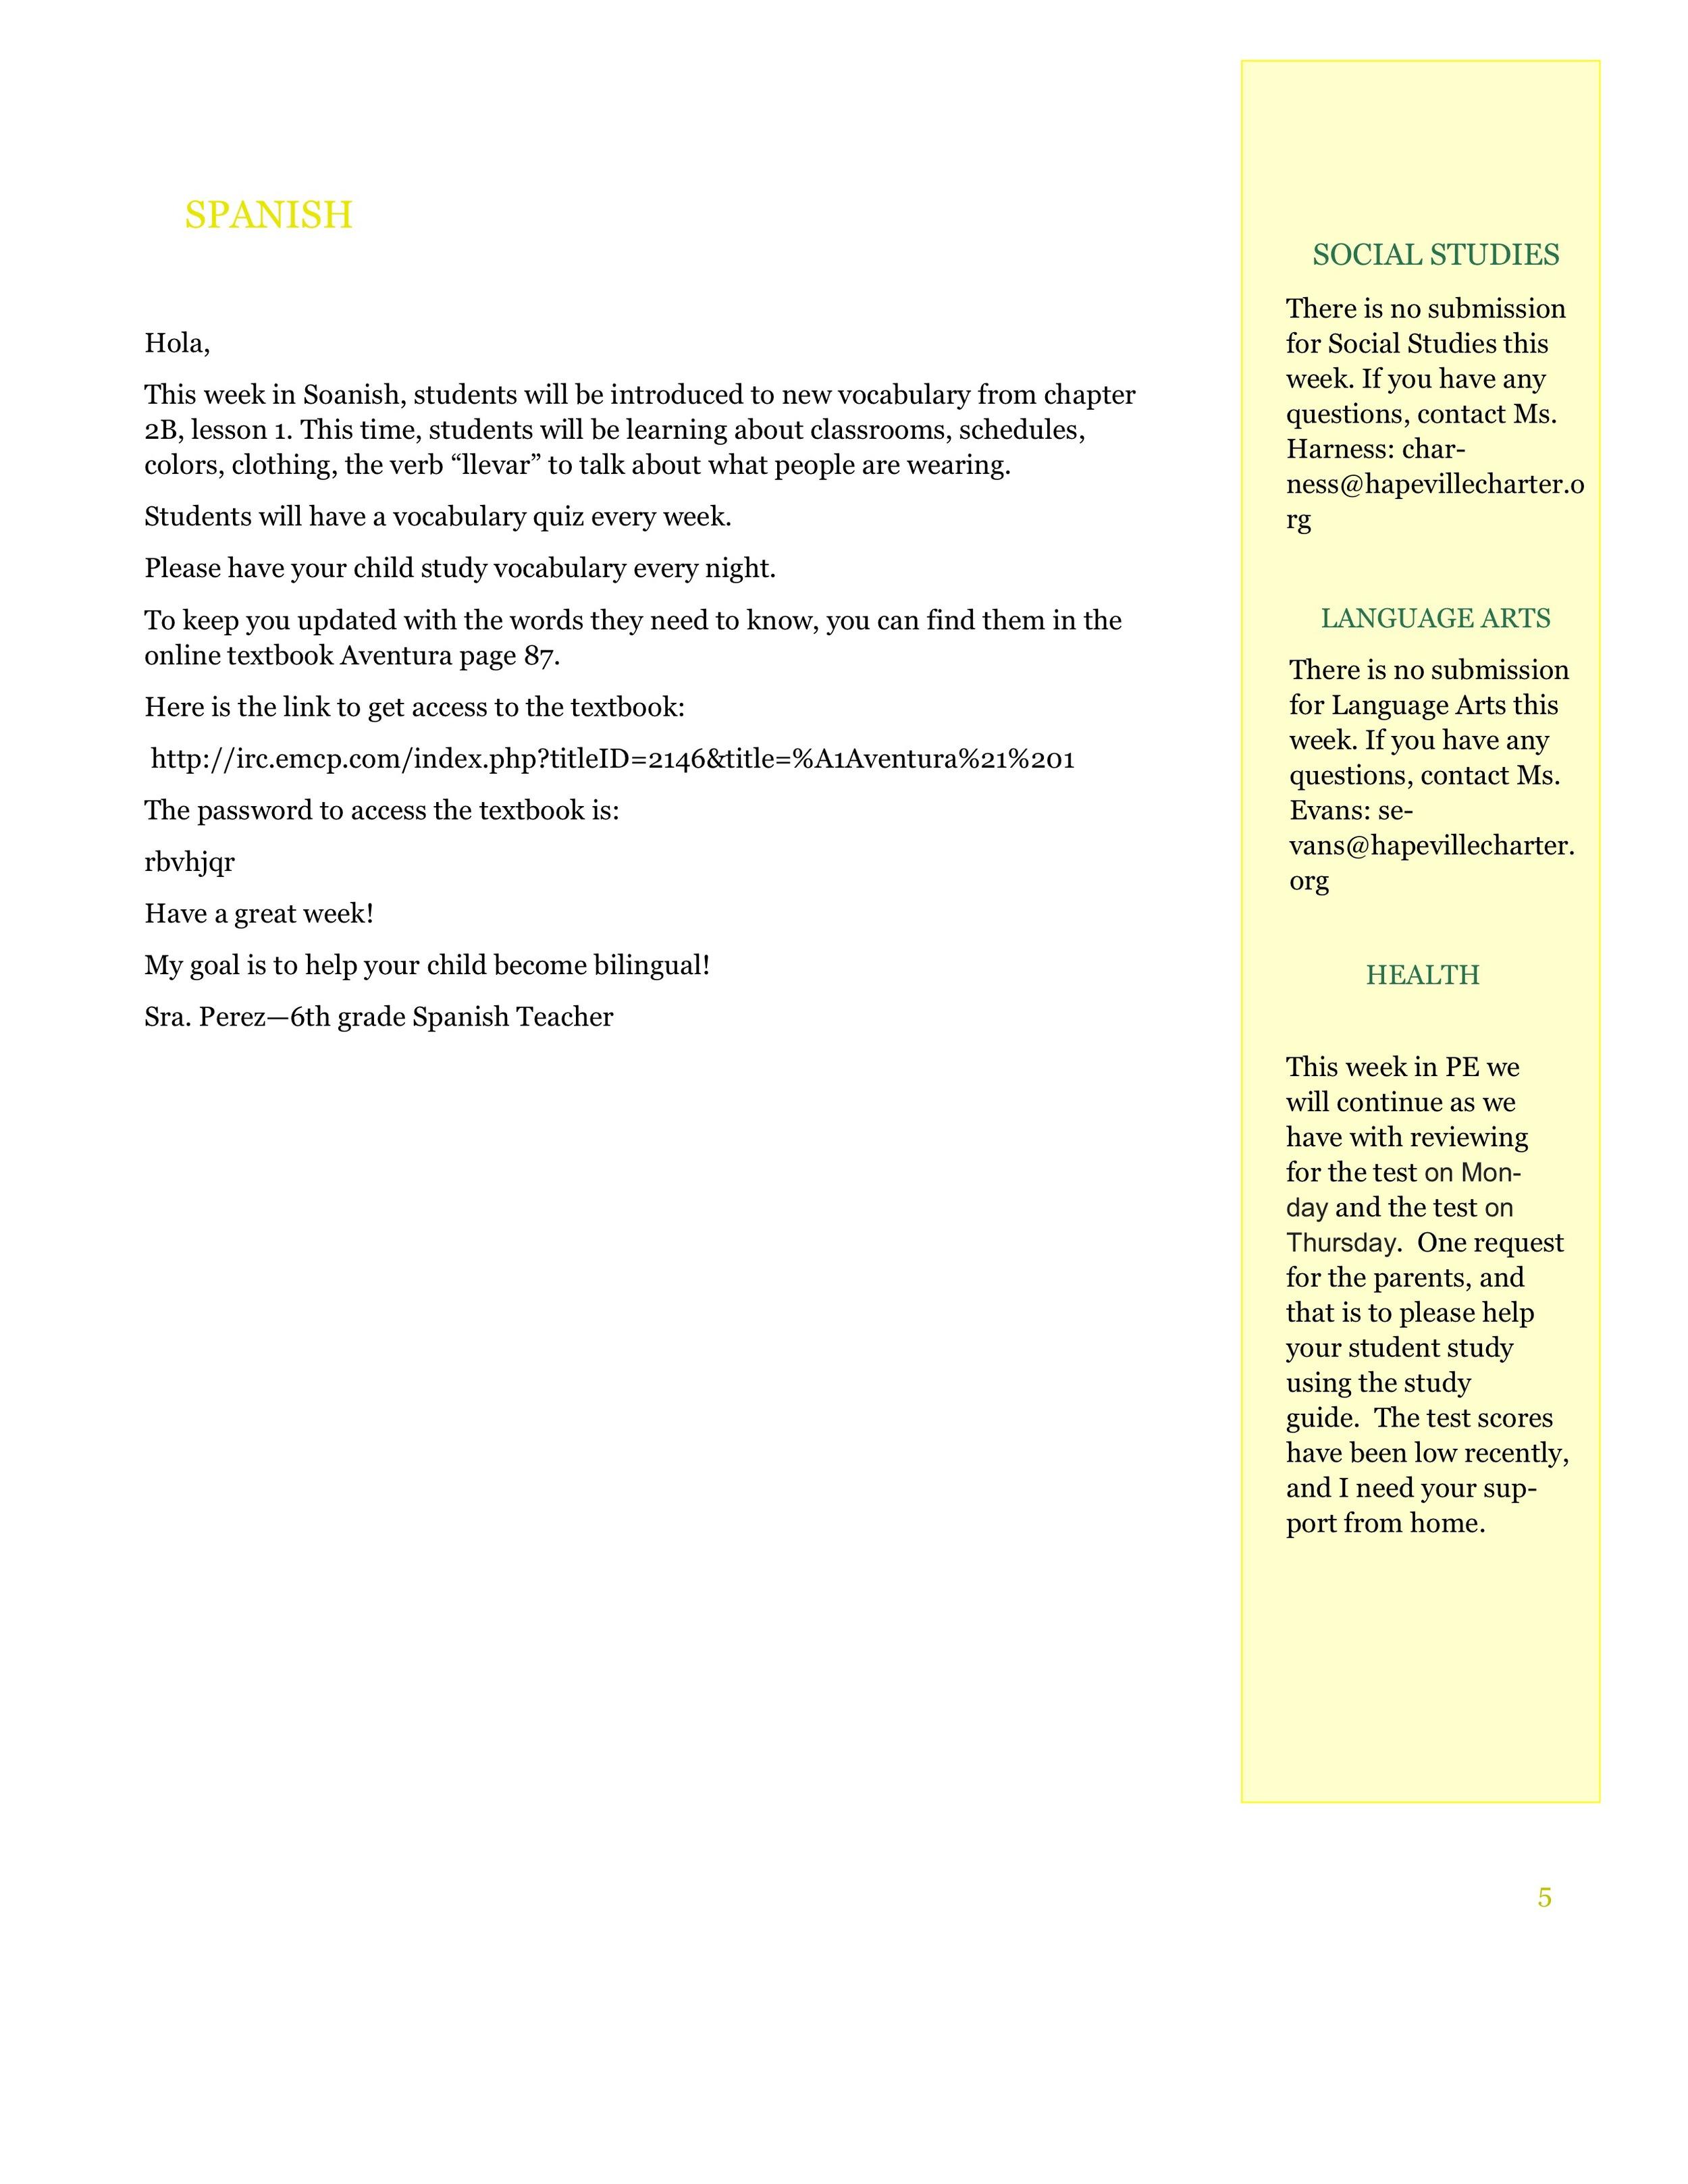 Newsletter Image6th grade January 26-30 5.jpeg